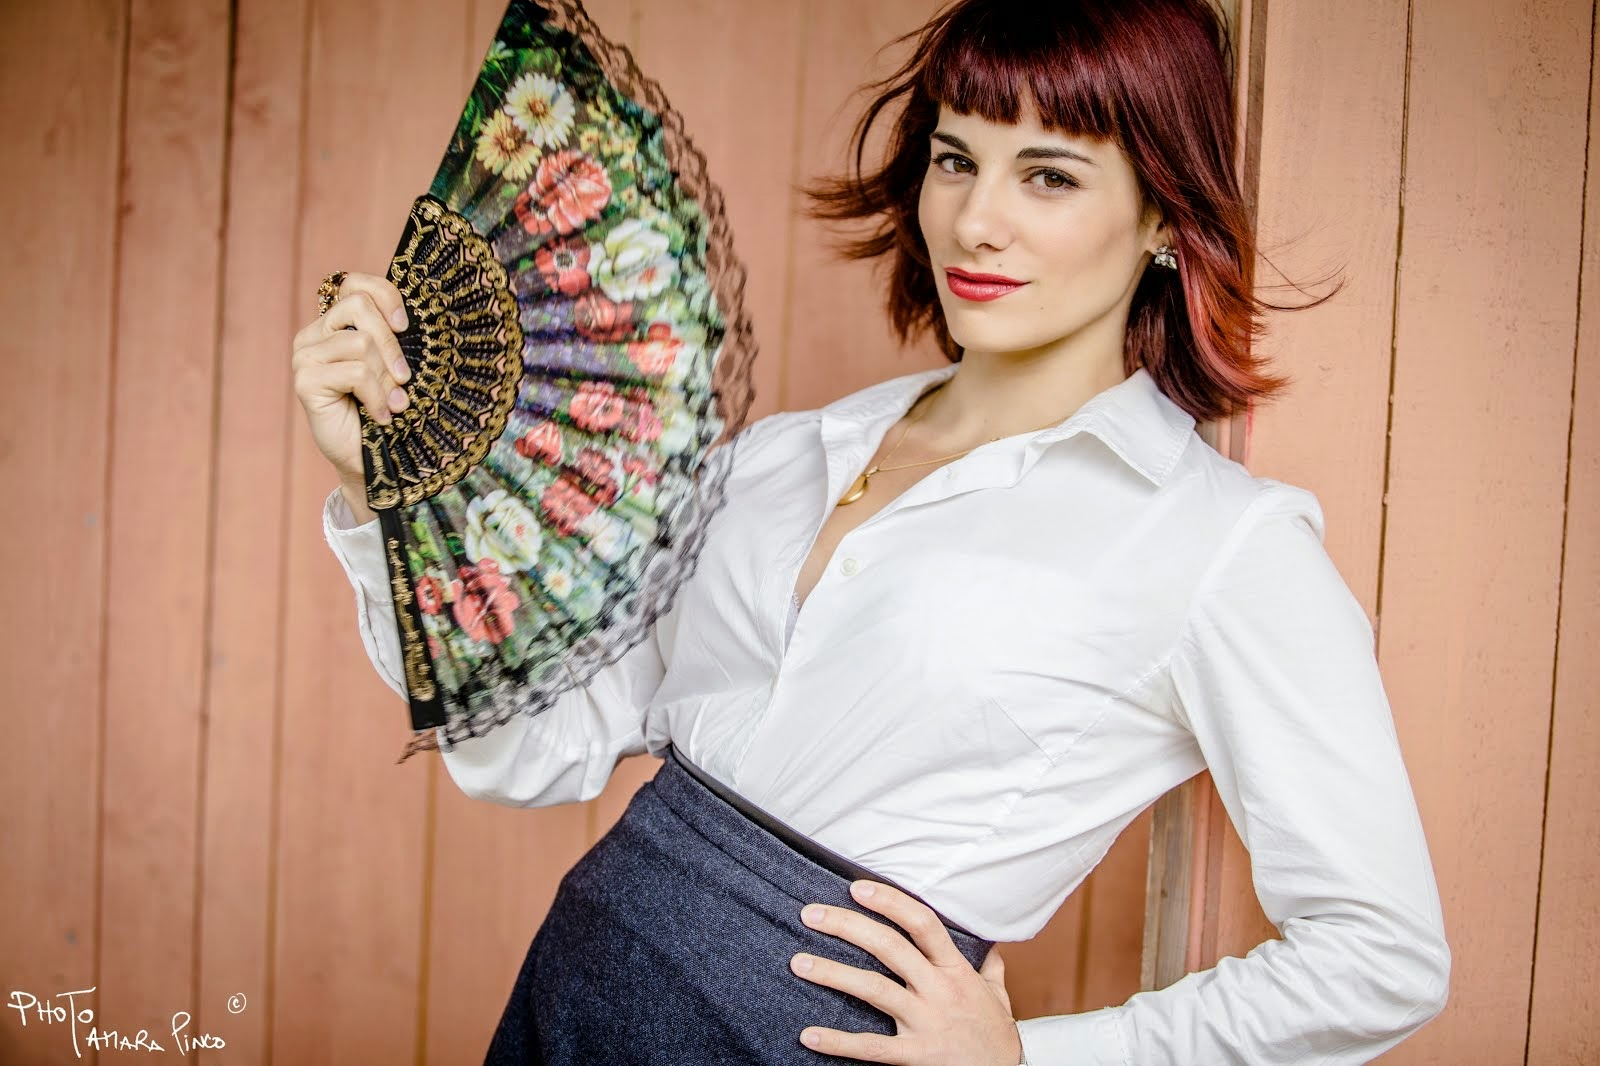 Evita Arce